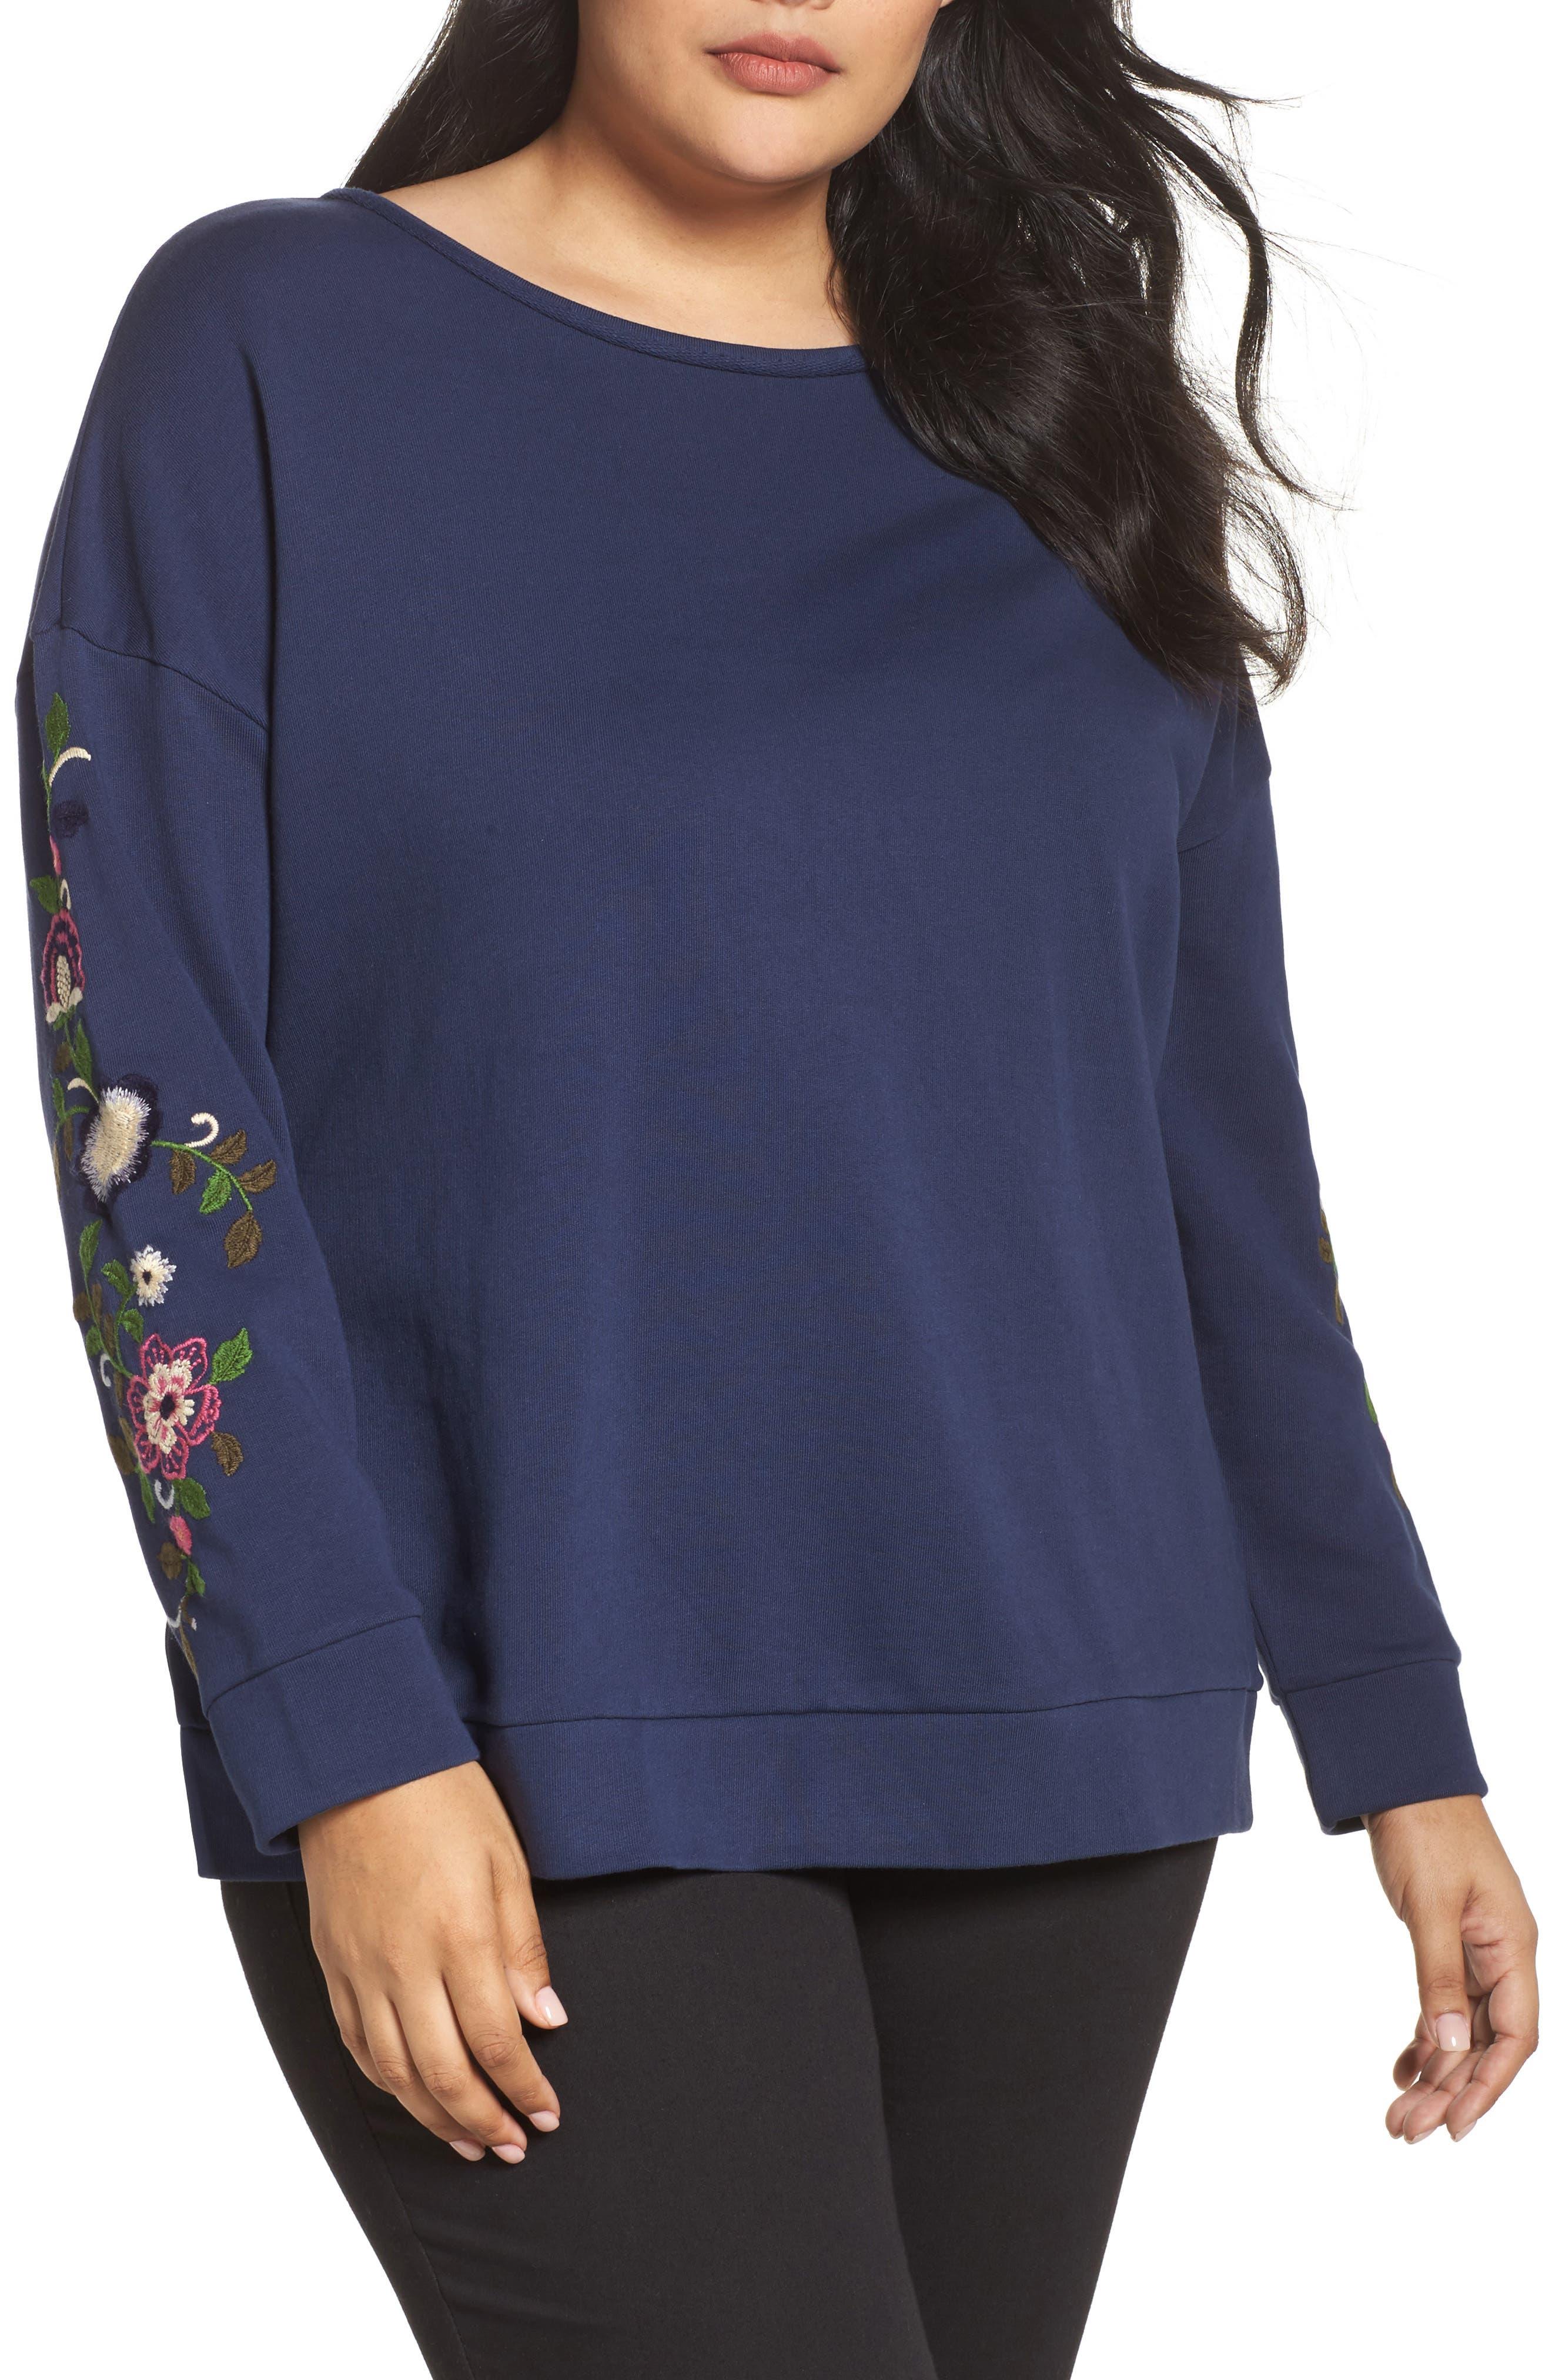 Main Image - Caslon® Embroidered Sleeve Sweatshirt (Plus Size)